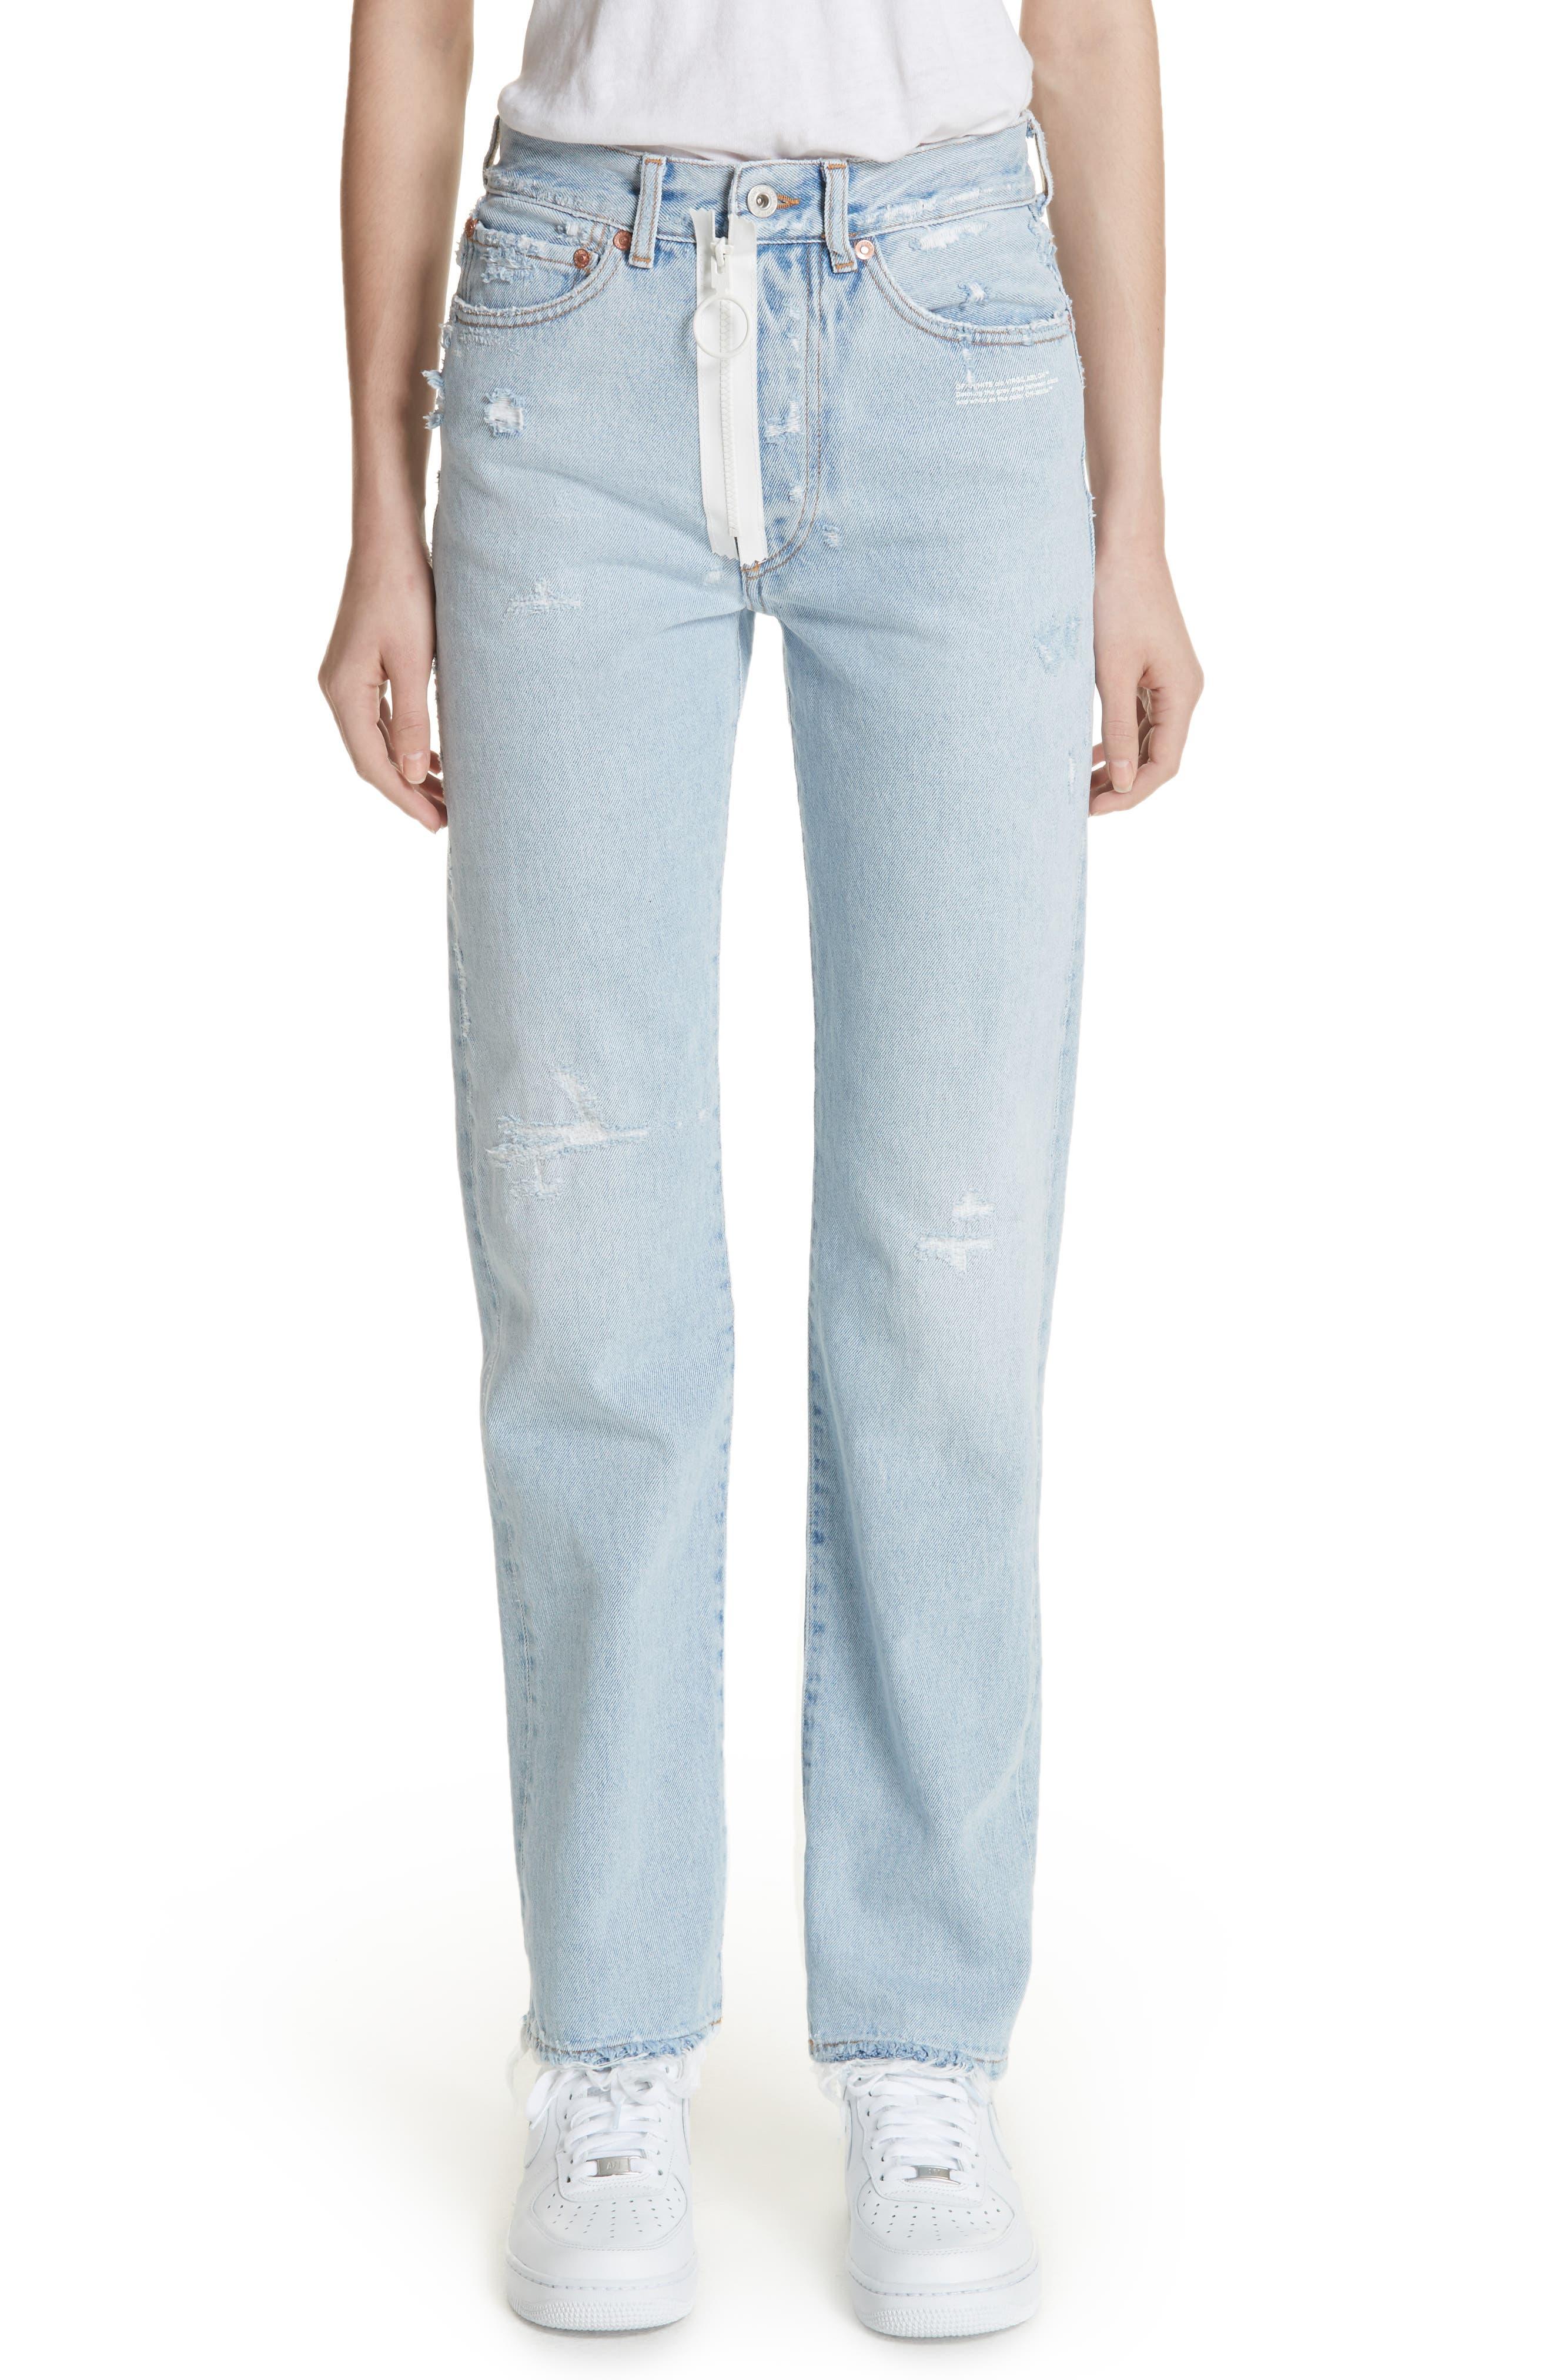 Off-White Distressed Straight Leg Jeans (Bleach/White)